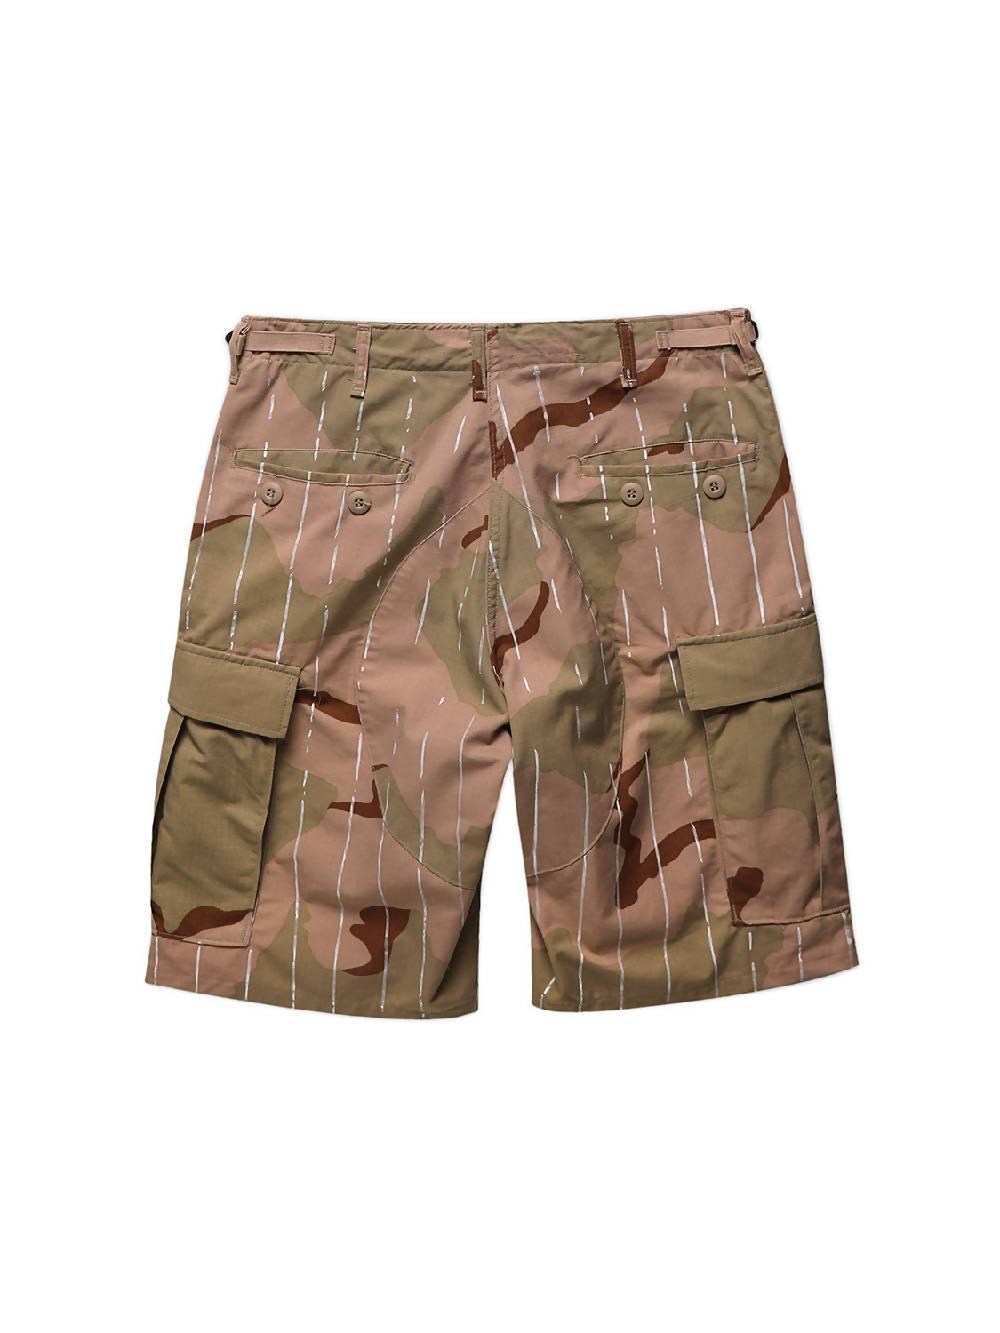 MYAR Camo USSRT90 US Army Shorts